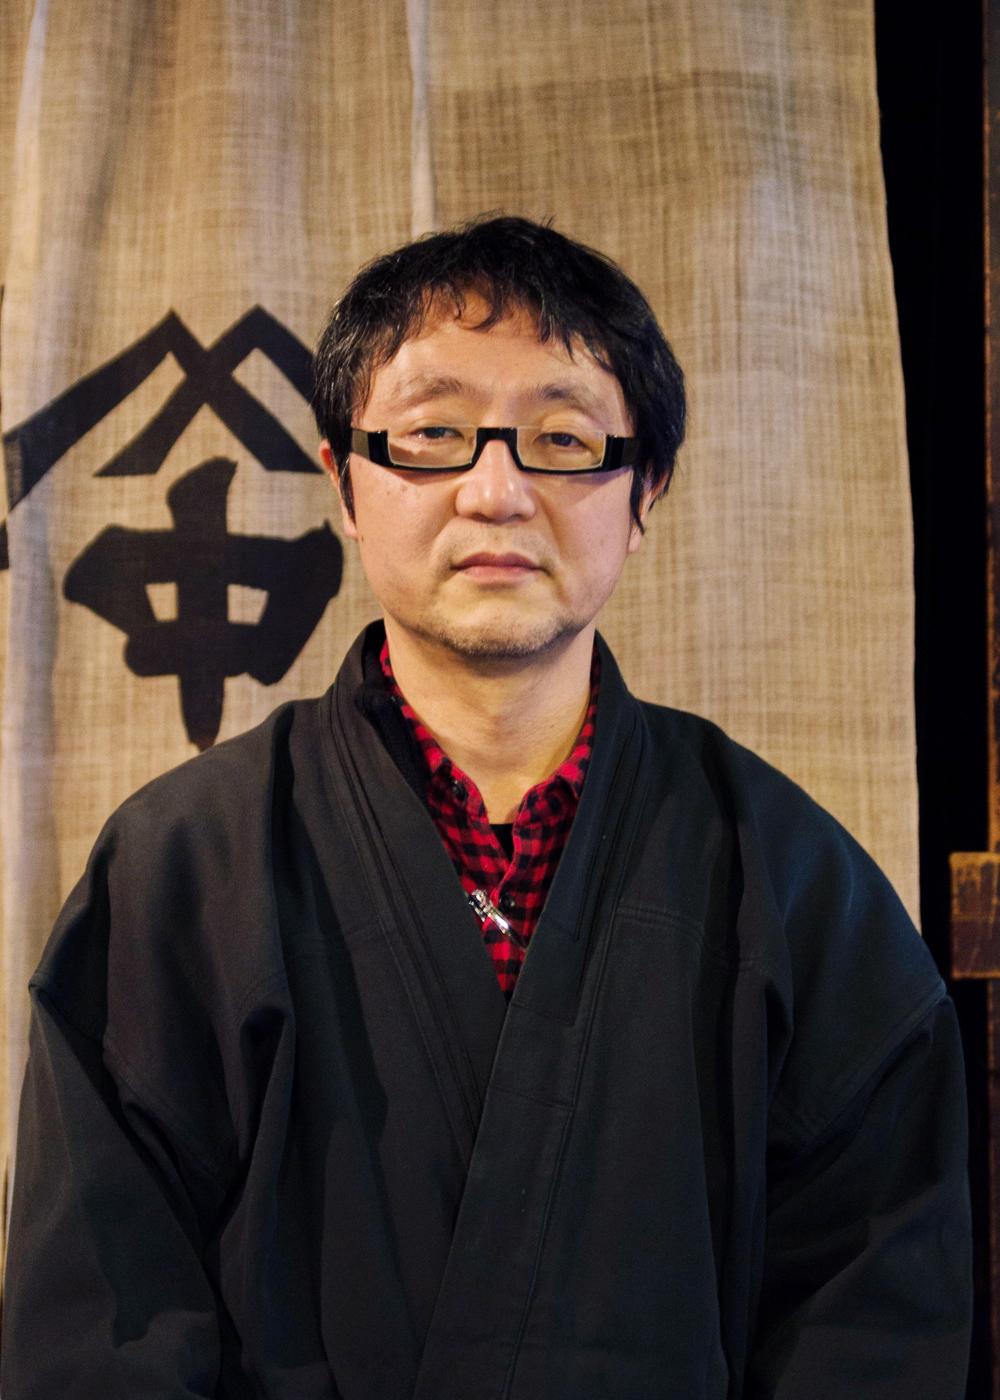 中野恵介/Keisuke Nakano